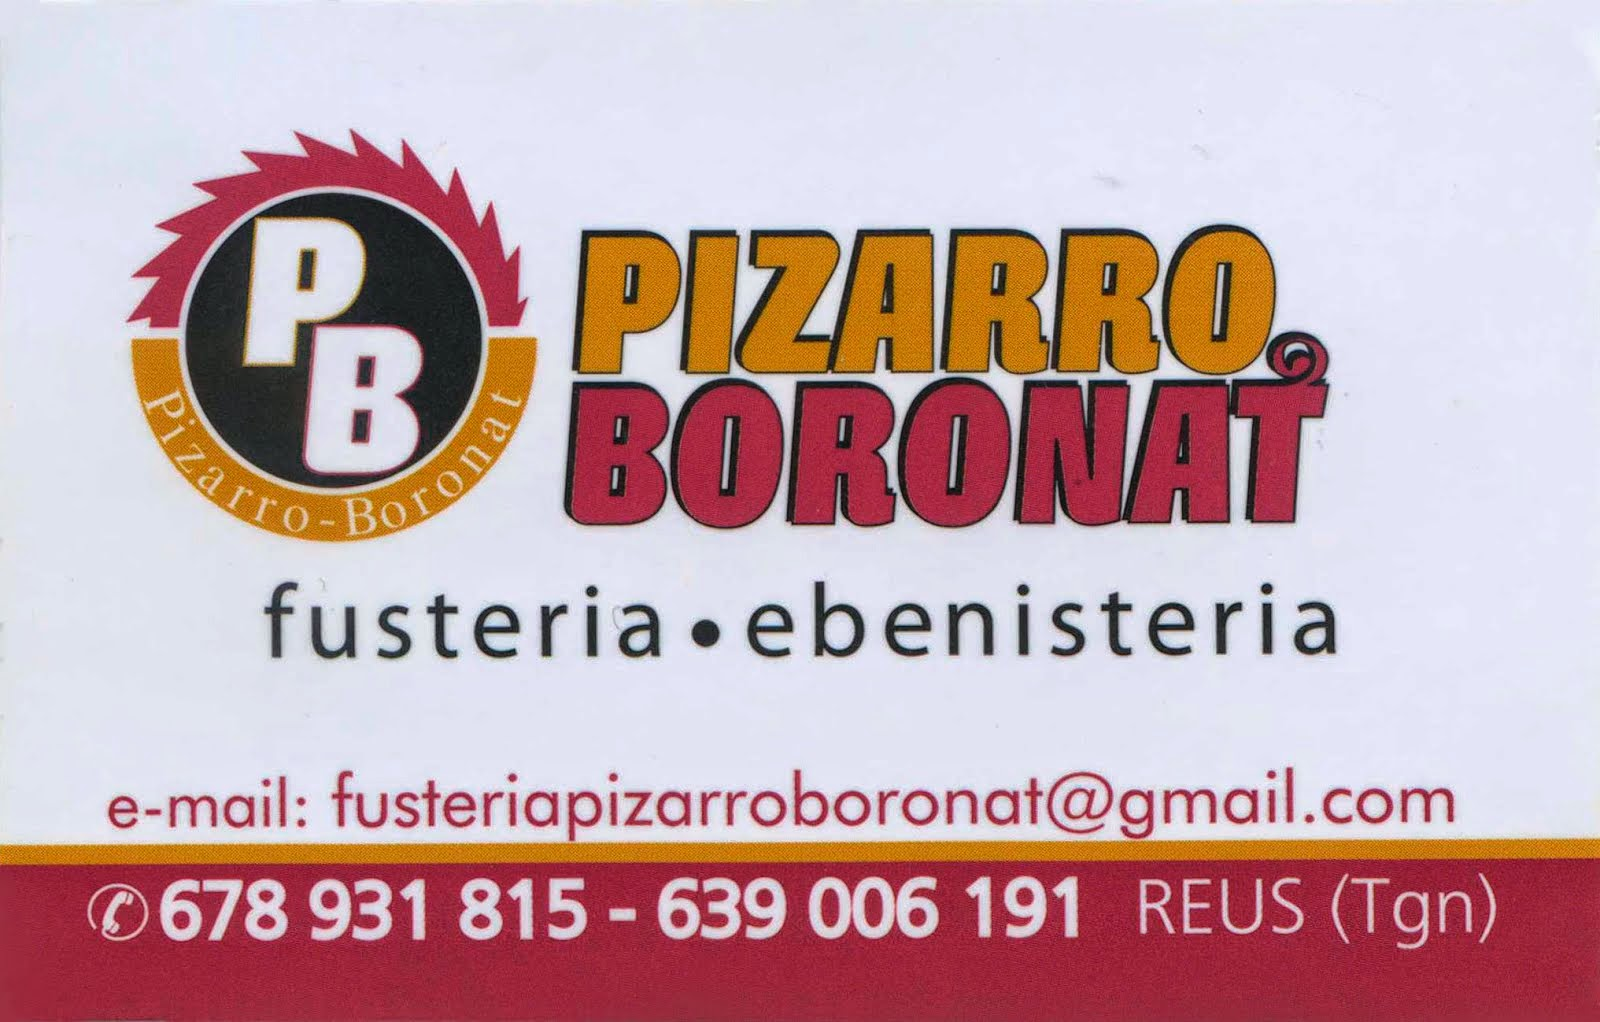 PIZARRO-BORONAT